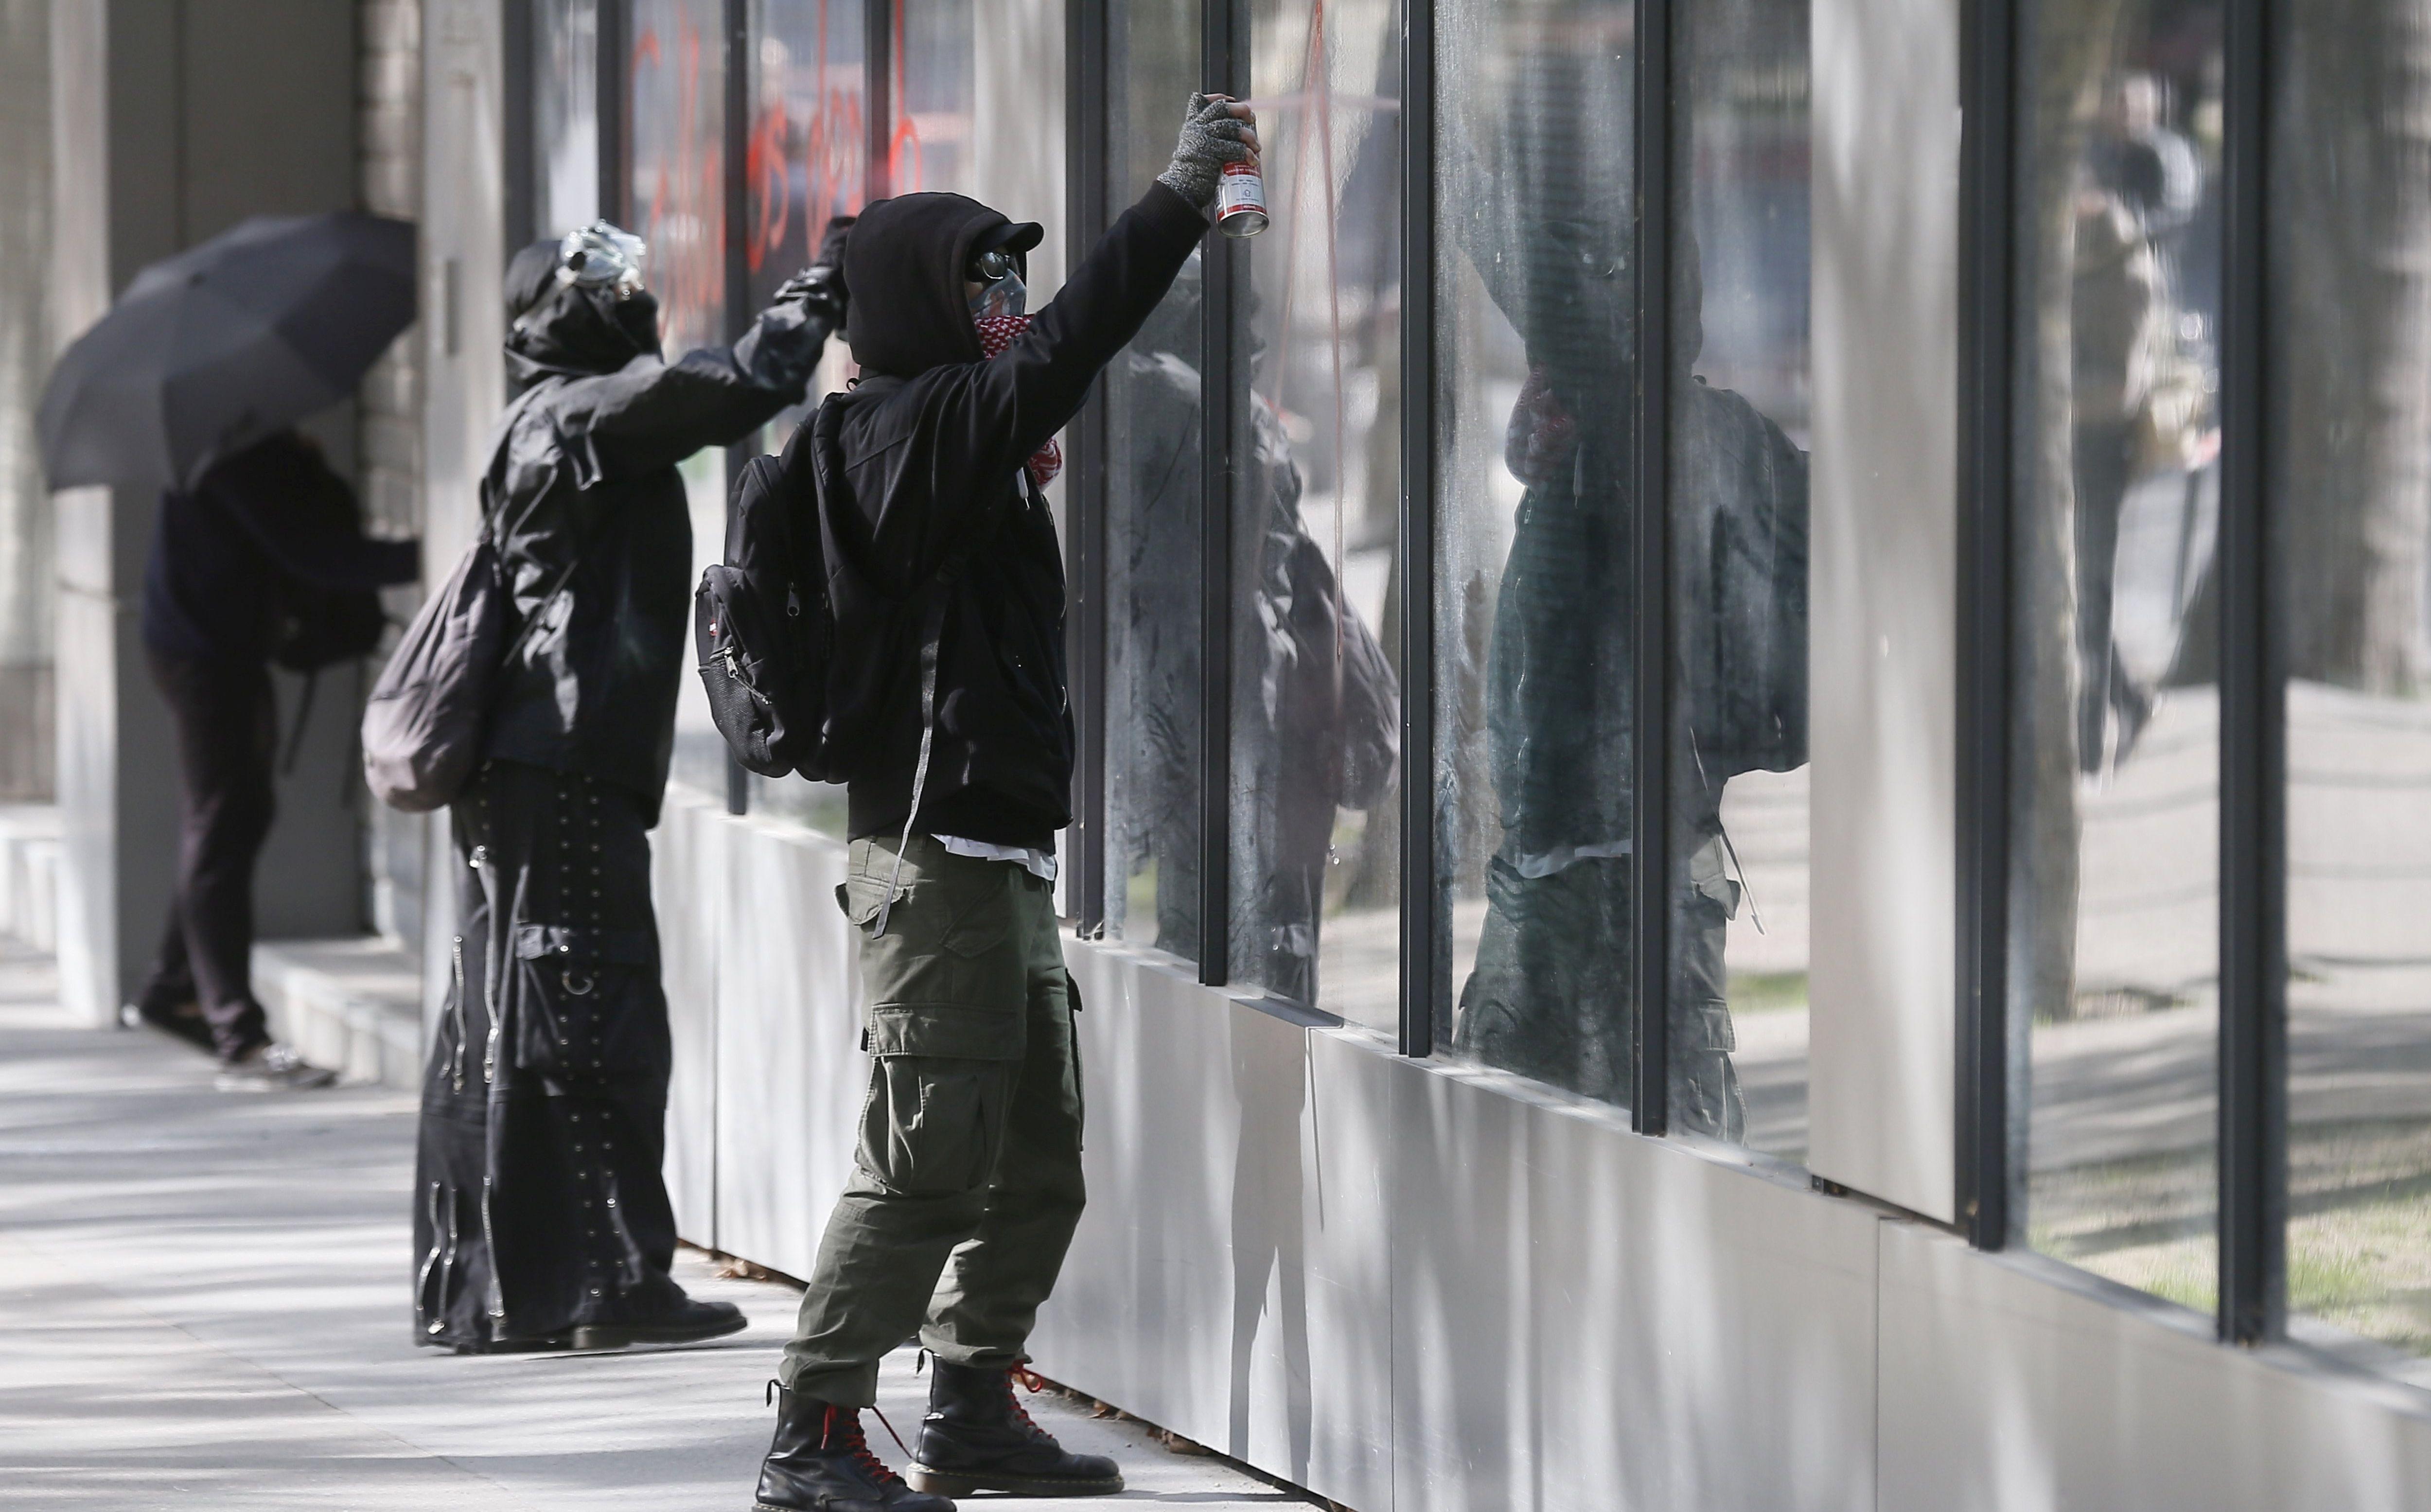 Slabe prosvjedi protiv Macronove radne reforme